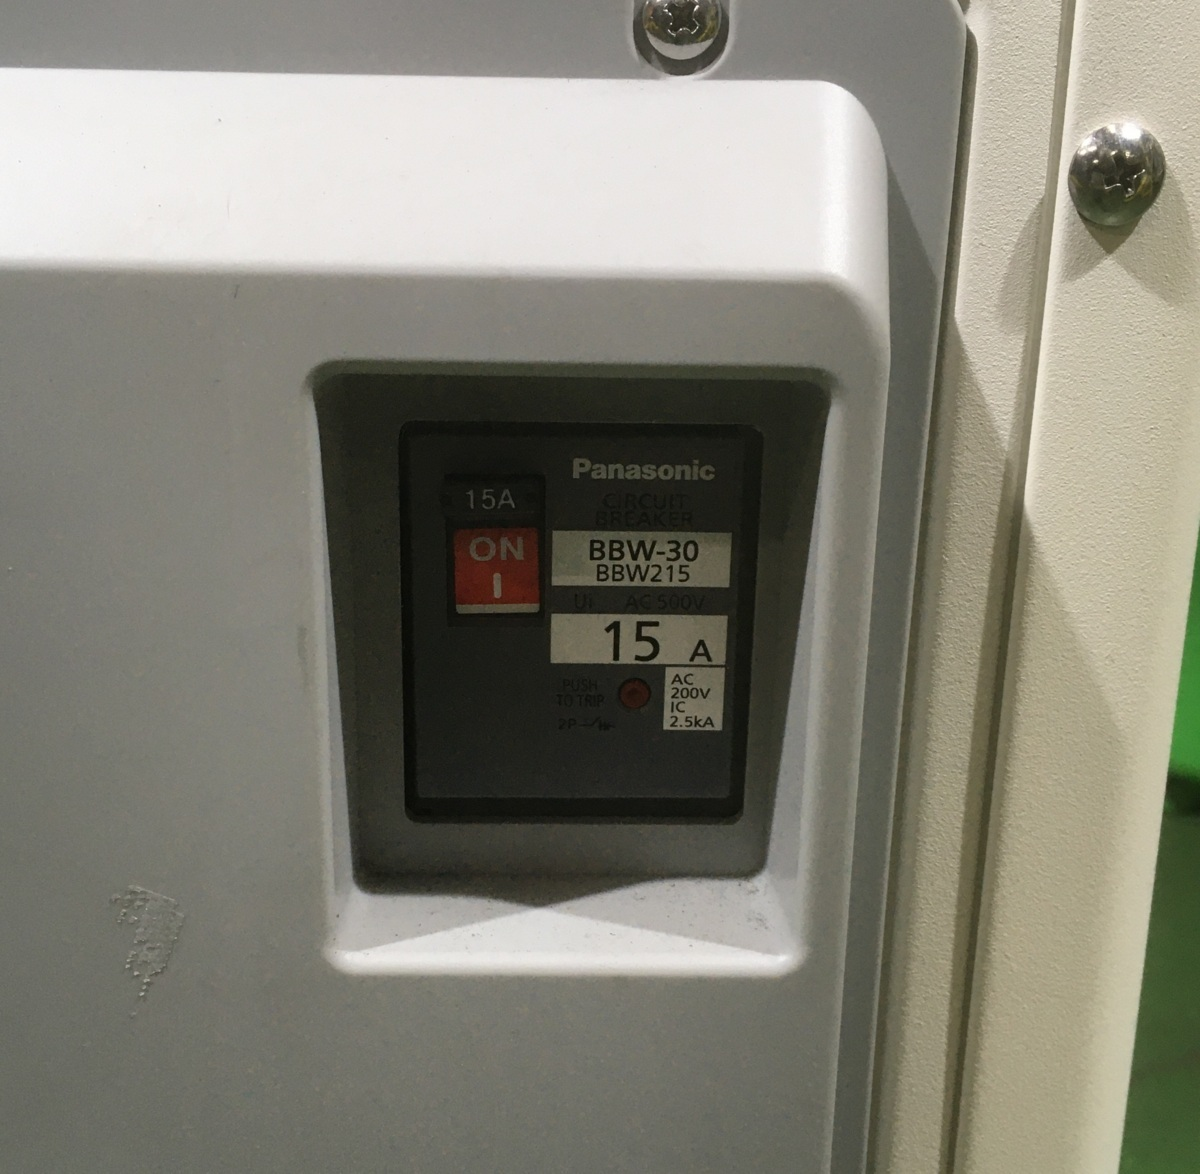 [ Saitama departure ][PANASONIC] LJ-SF50A lithium ion accumulation of electricity system operation verification ending (9-1594)